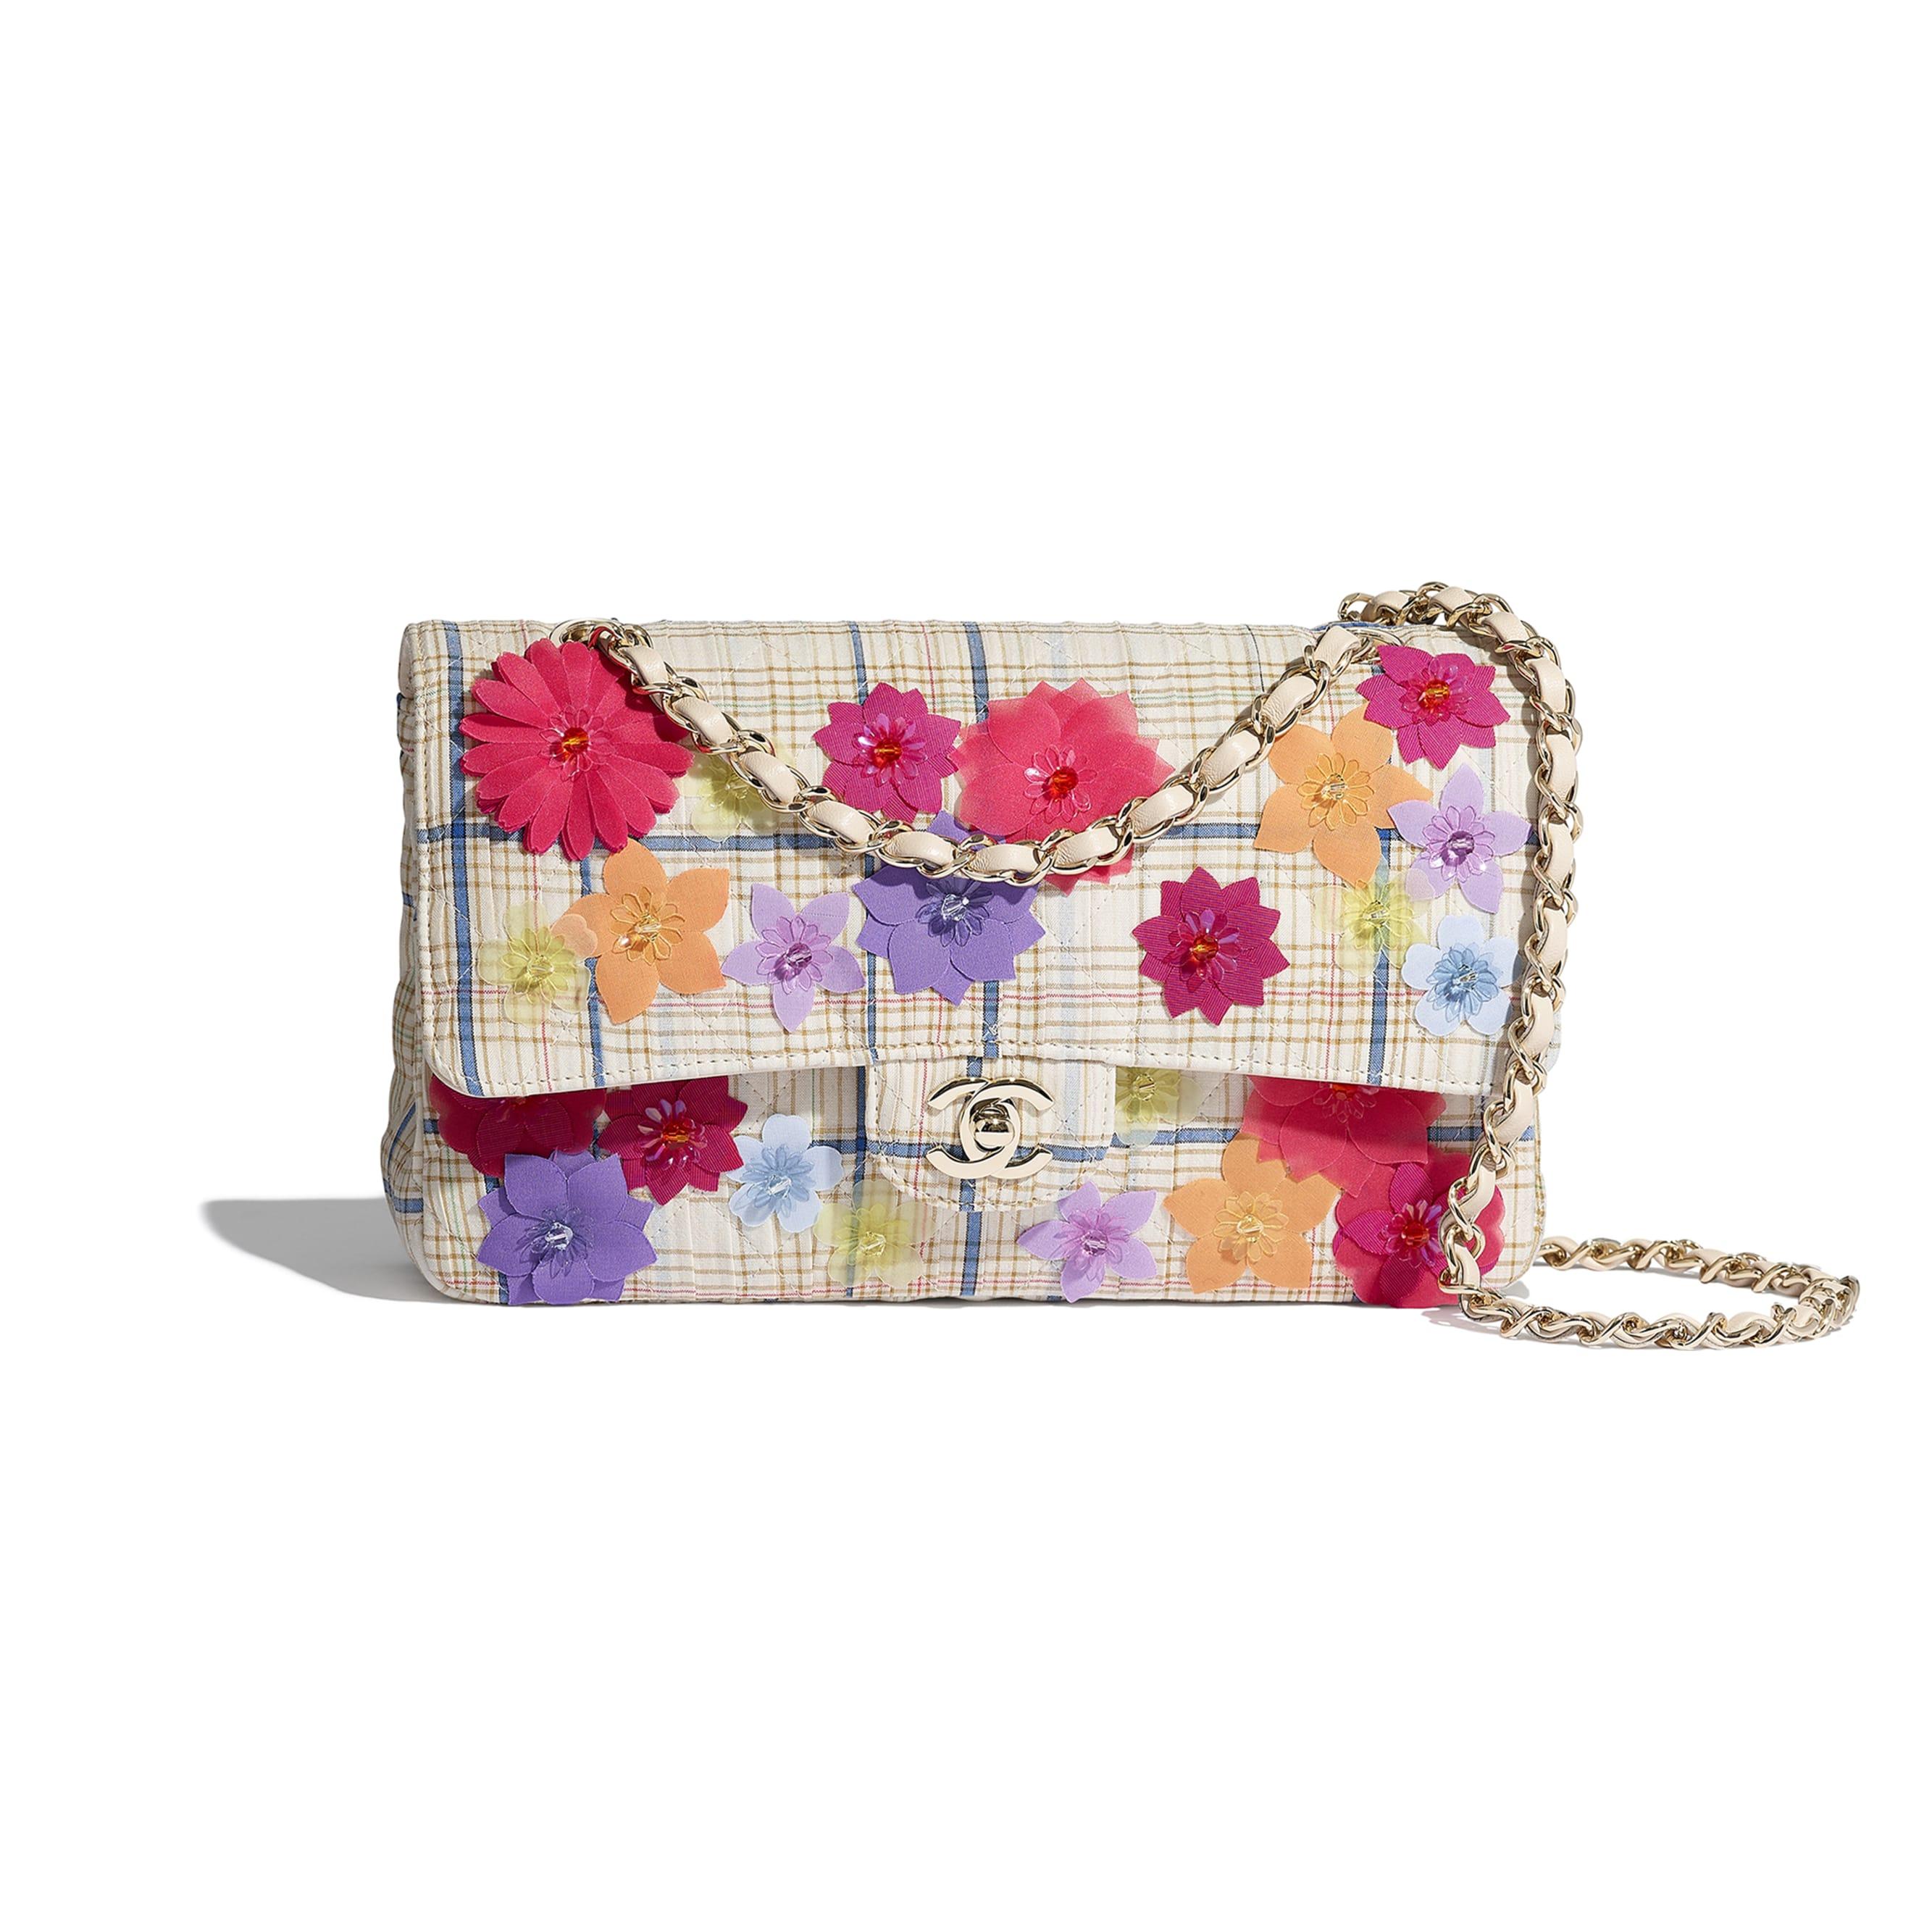 Classic Handbag - Ecru, Blue & Yellow - Cotton, Silk, Calfskin & Gold-Tone Metal - CHANEL - Default view - see standard sized version